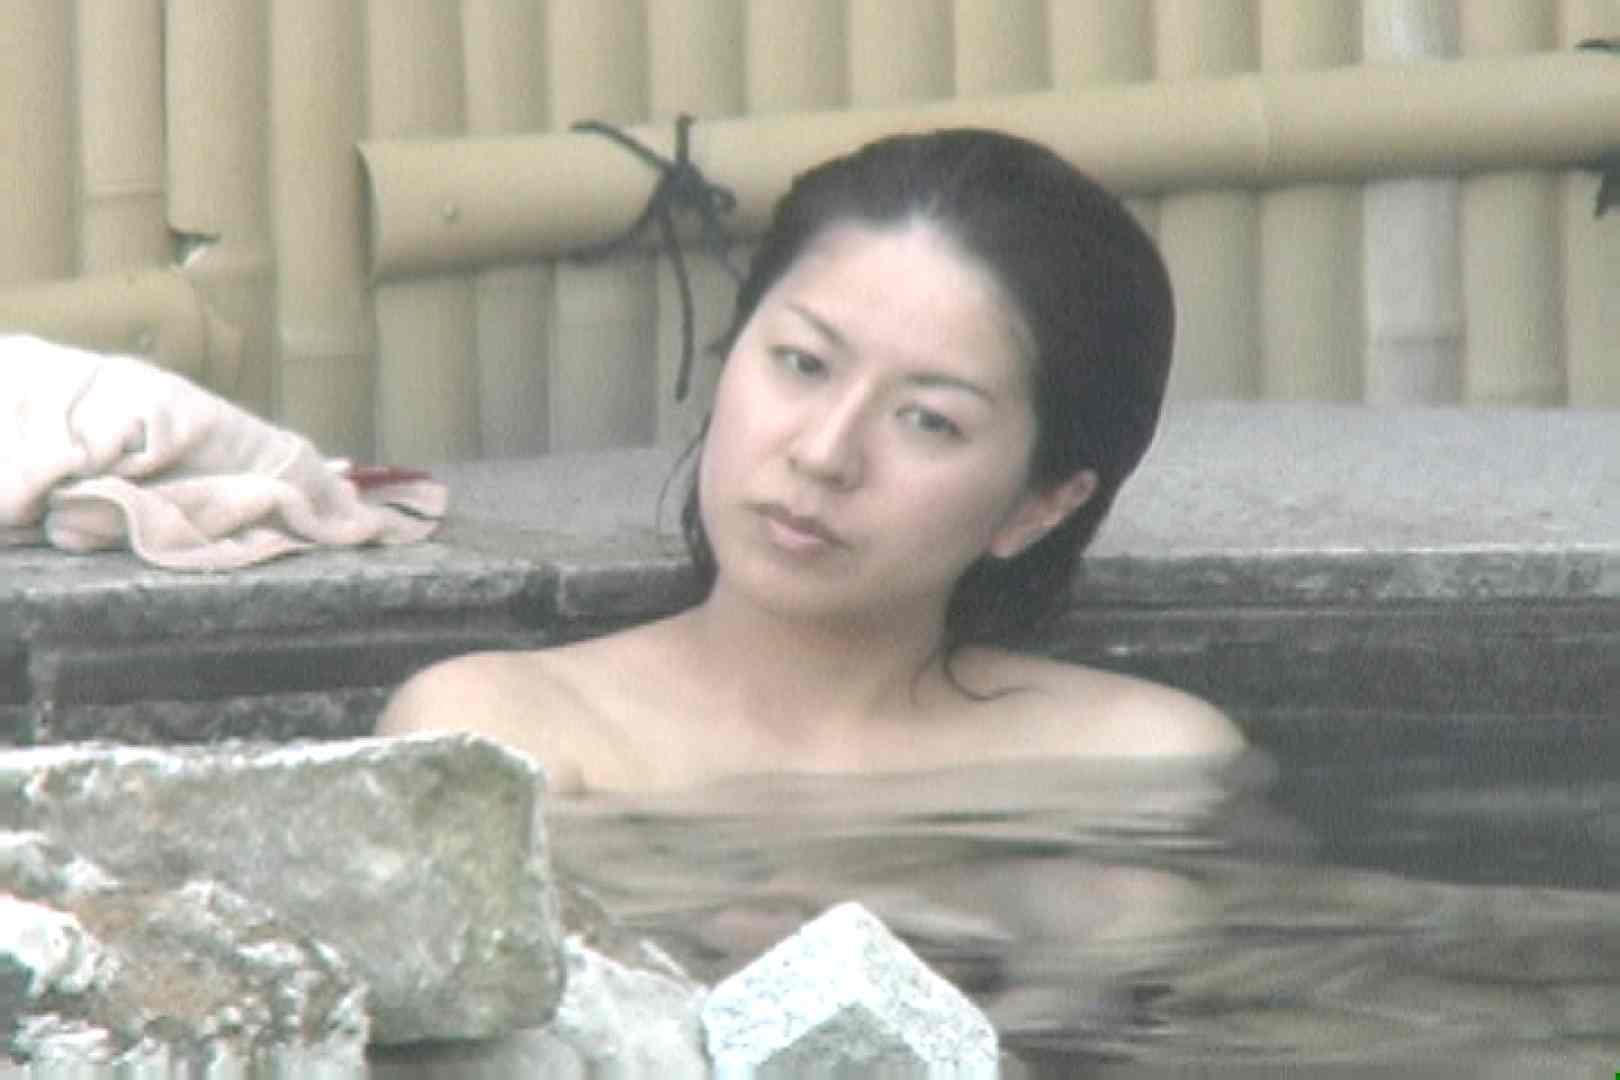 Aquaな露天風呂Vol.694 盗撮 | OLエロ画像  110PICs 100